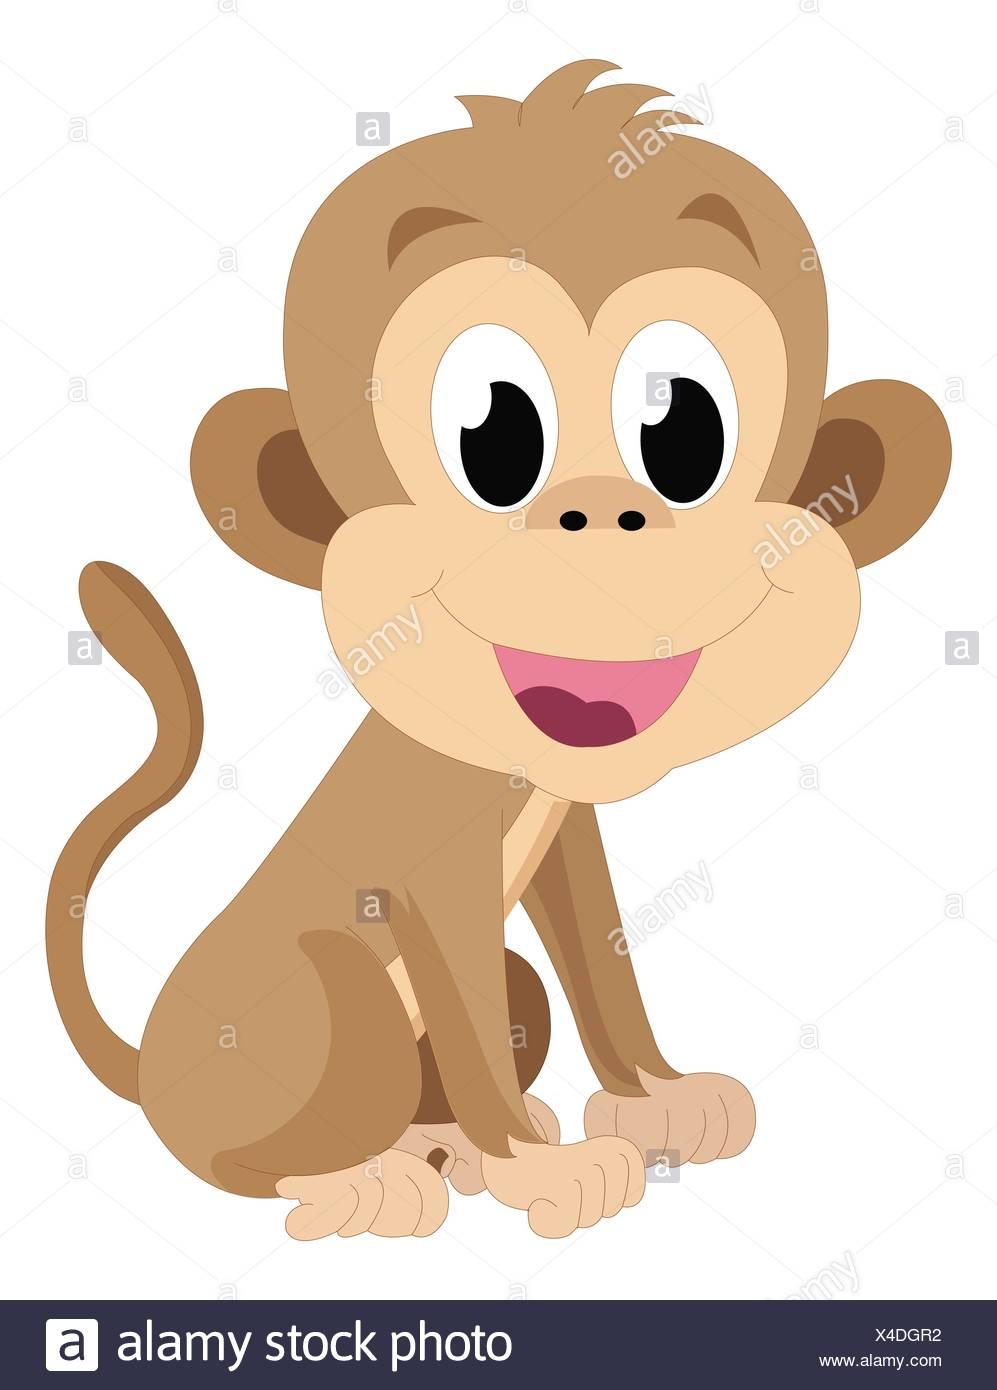 Monkey Vector Illustration Stockfotos & Monkey Vector Illustration ...